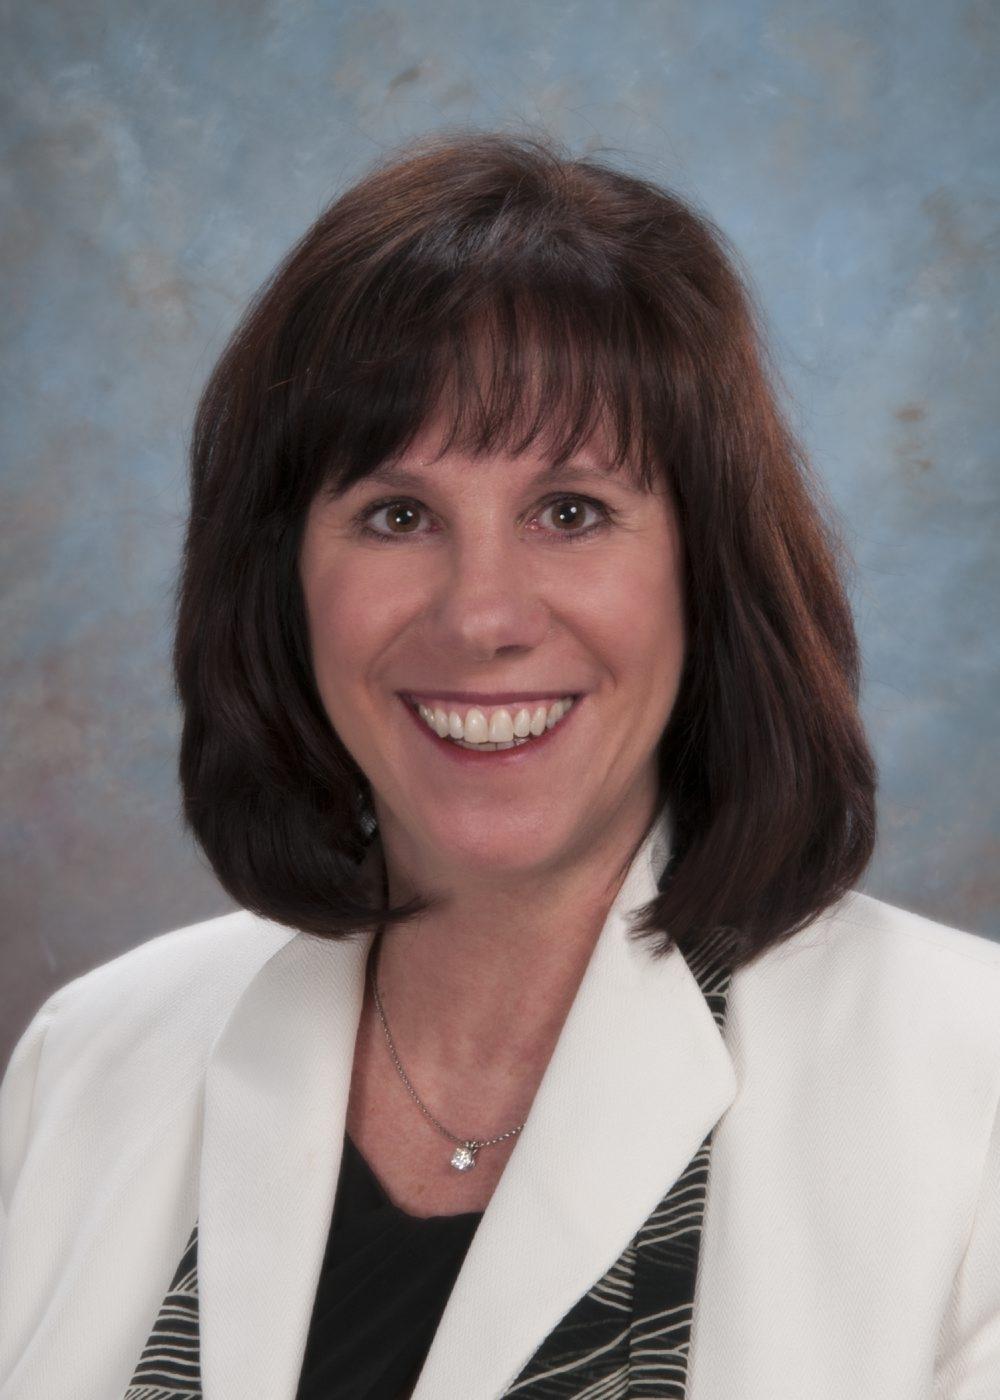 Bonnie R. Sloma